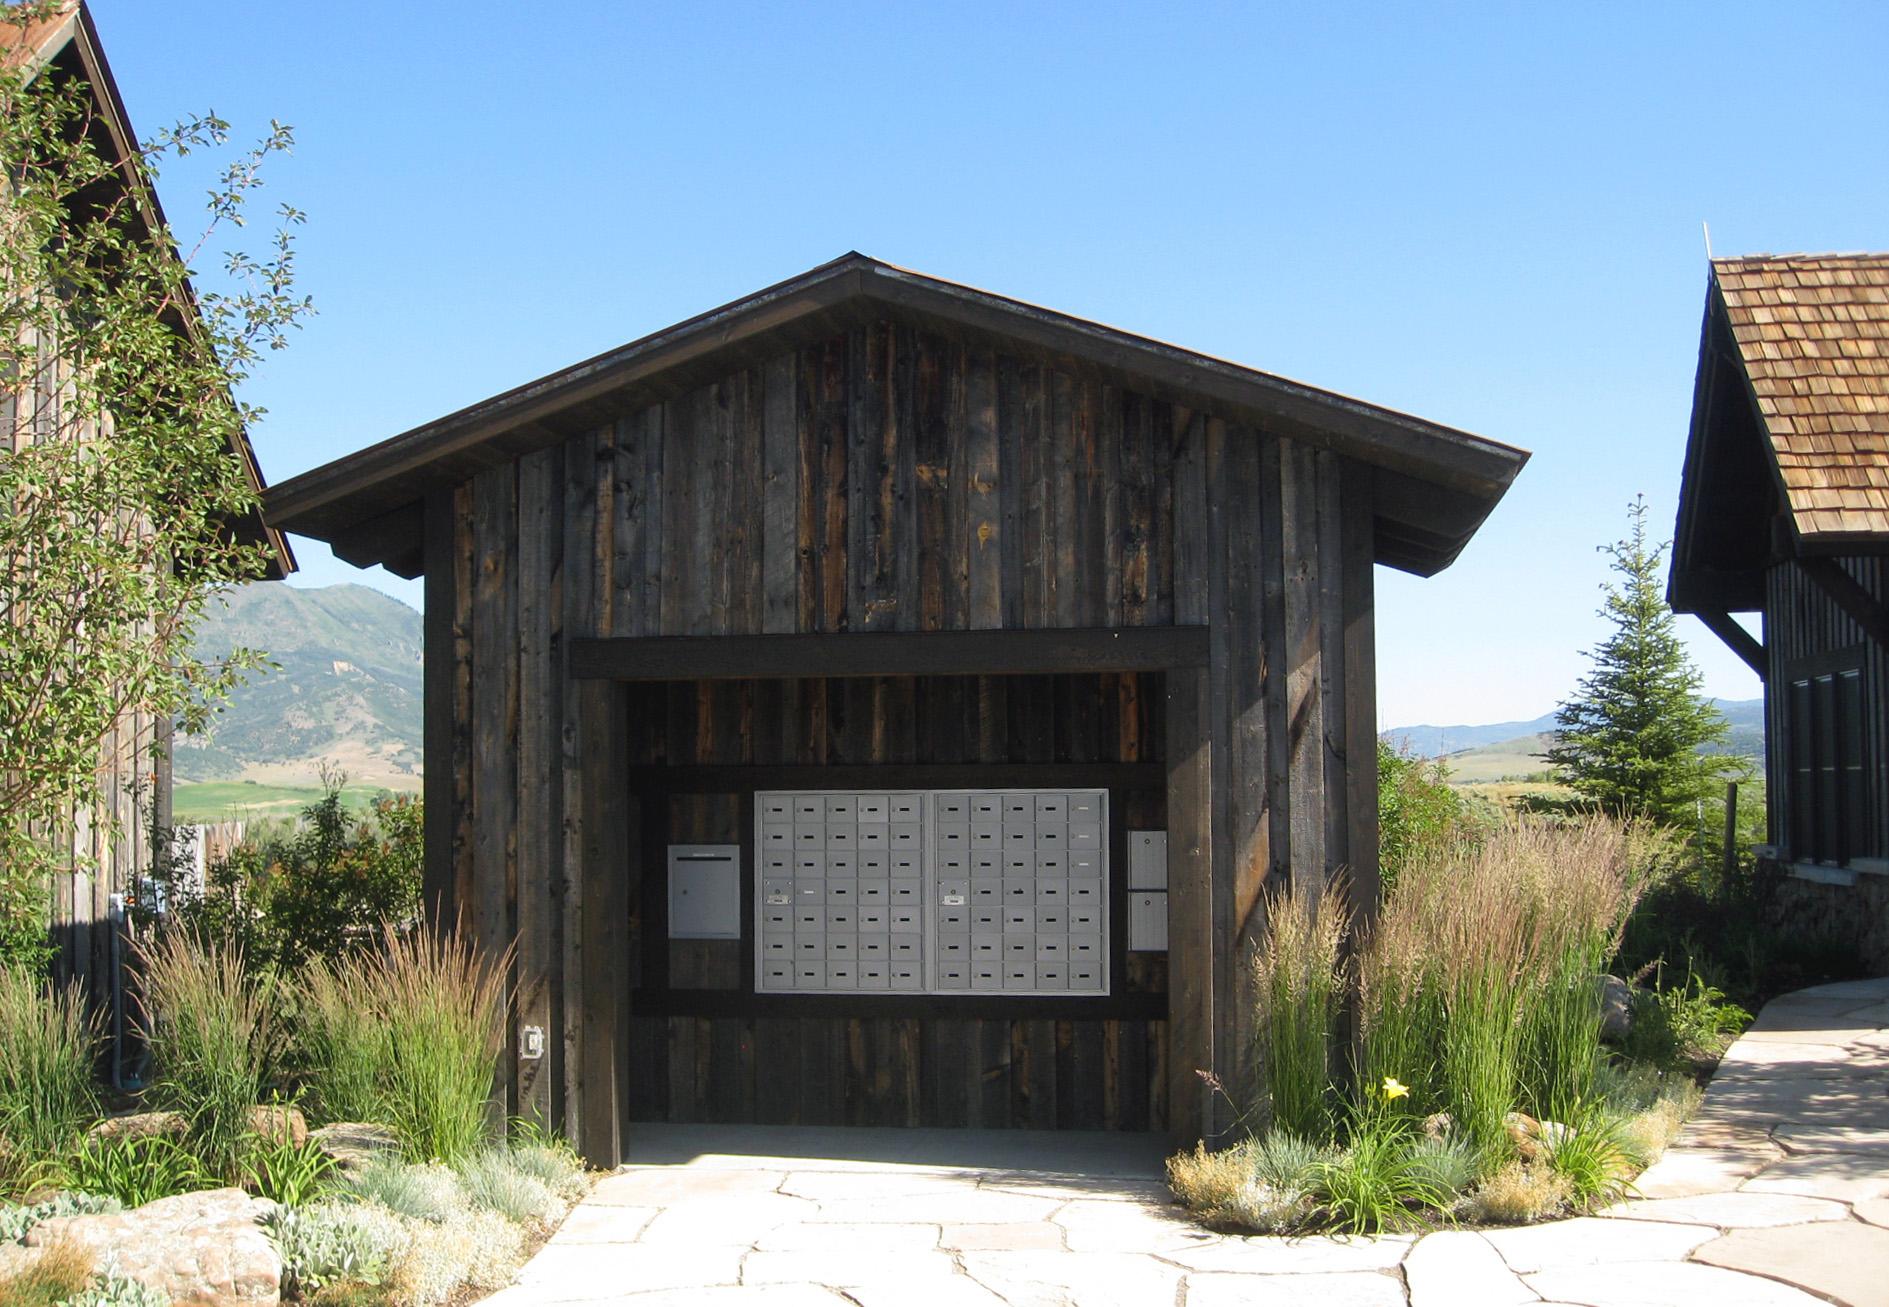 marabou_ranch_steamboat_colorado_cabin.jpg